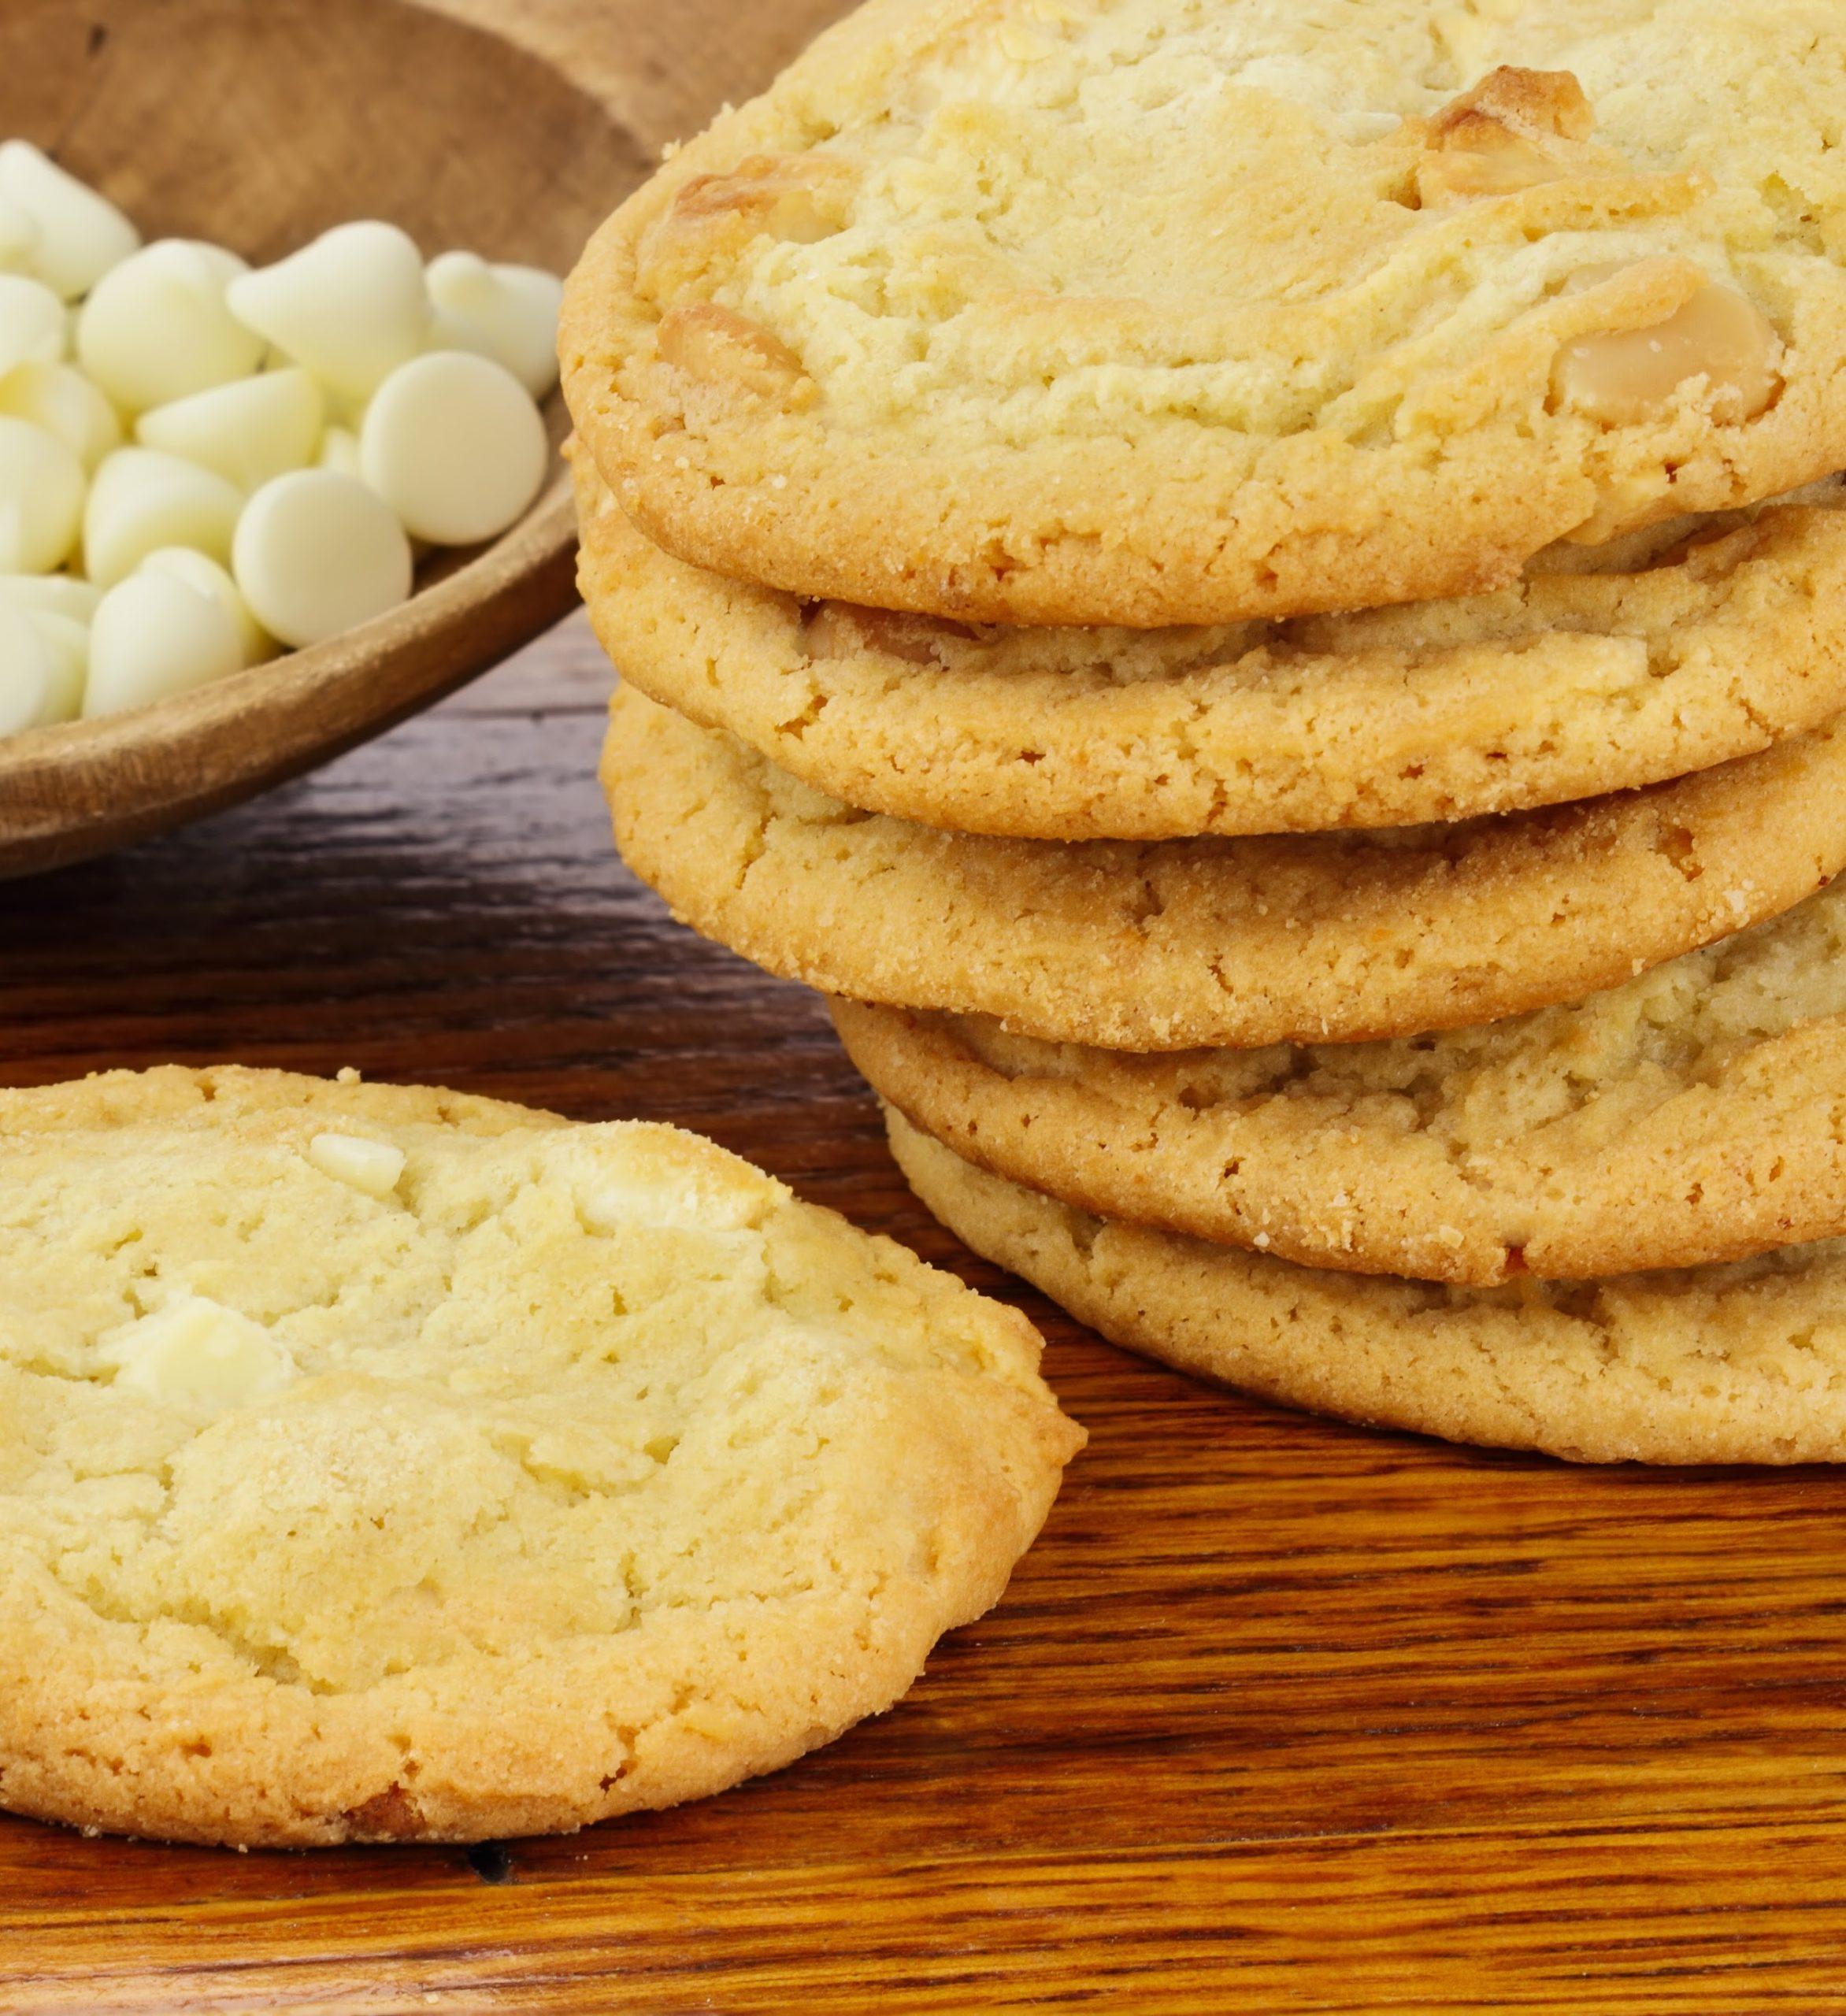 keto white chocolate macademia cookies stacked on wood table